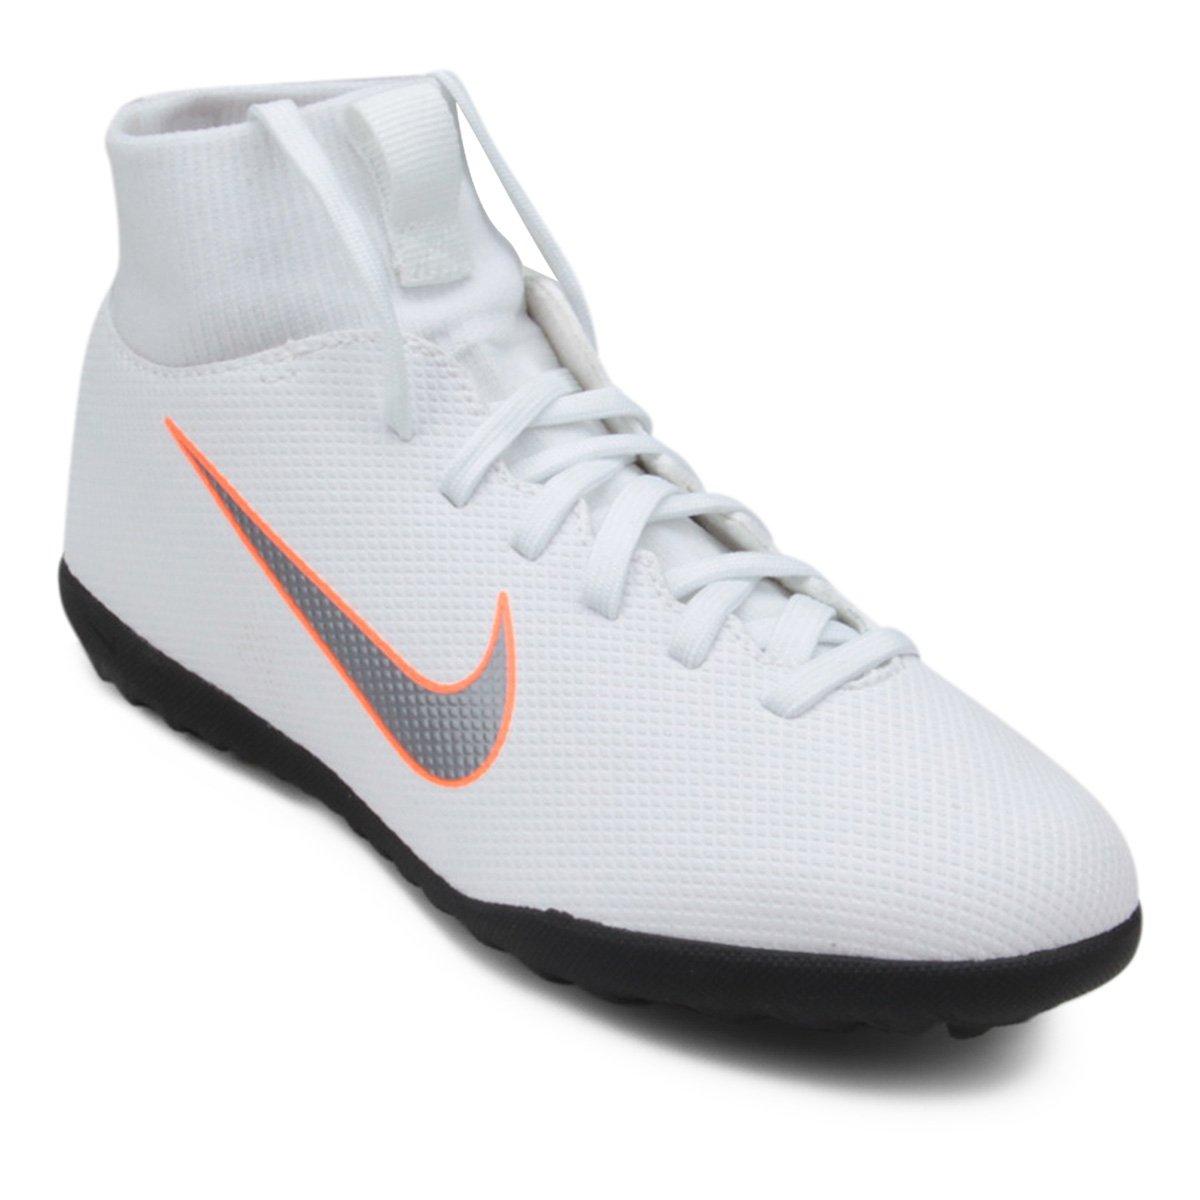 5c4f3f5e71612 Chuteira Society Infantil Nike Mercurial Superfly 6 Club - Branco e Cinza -  Compre Agora